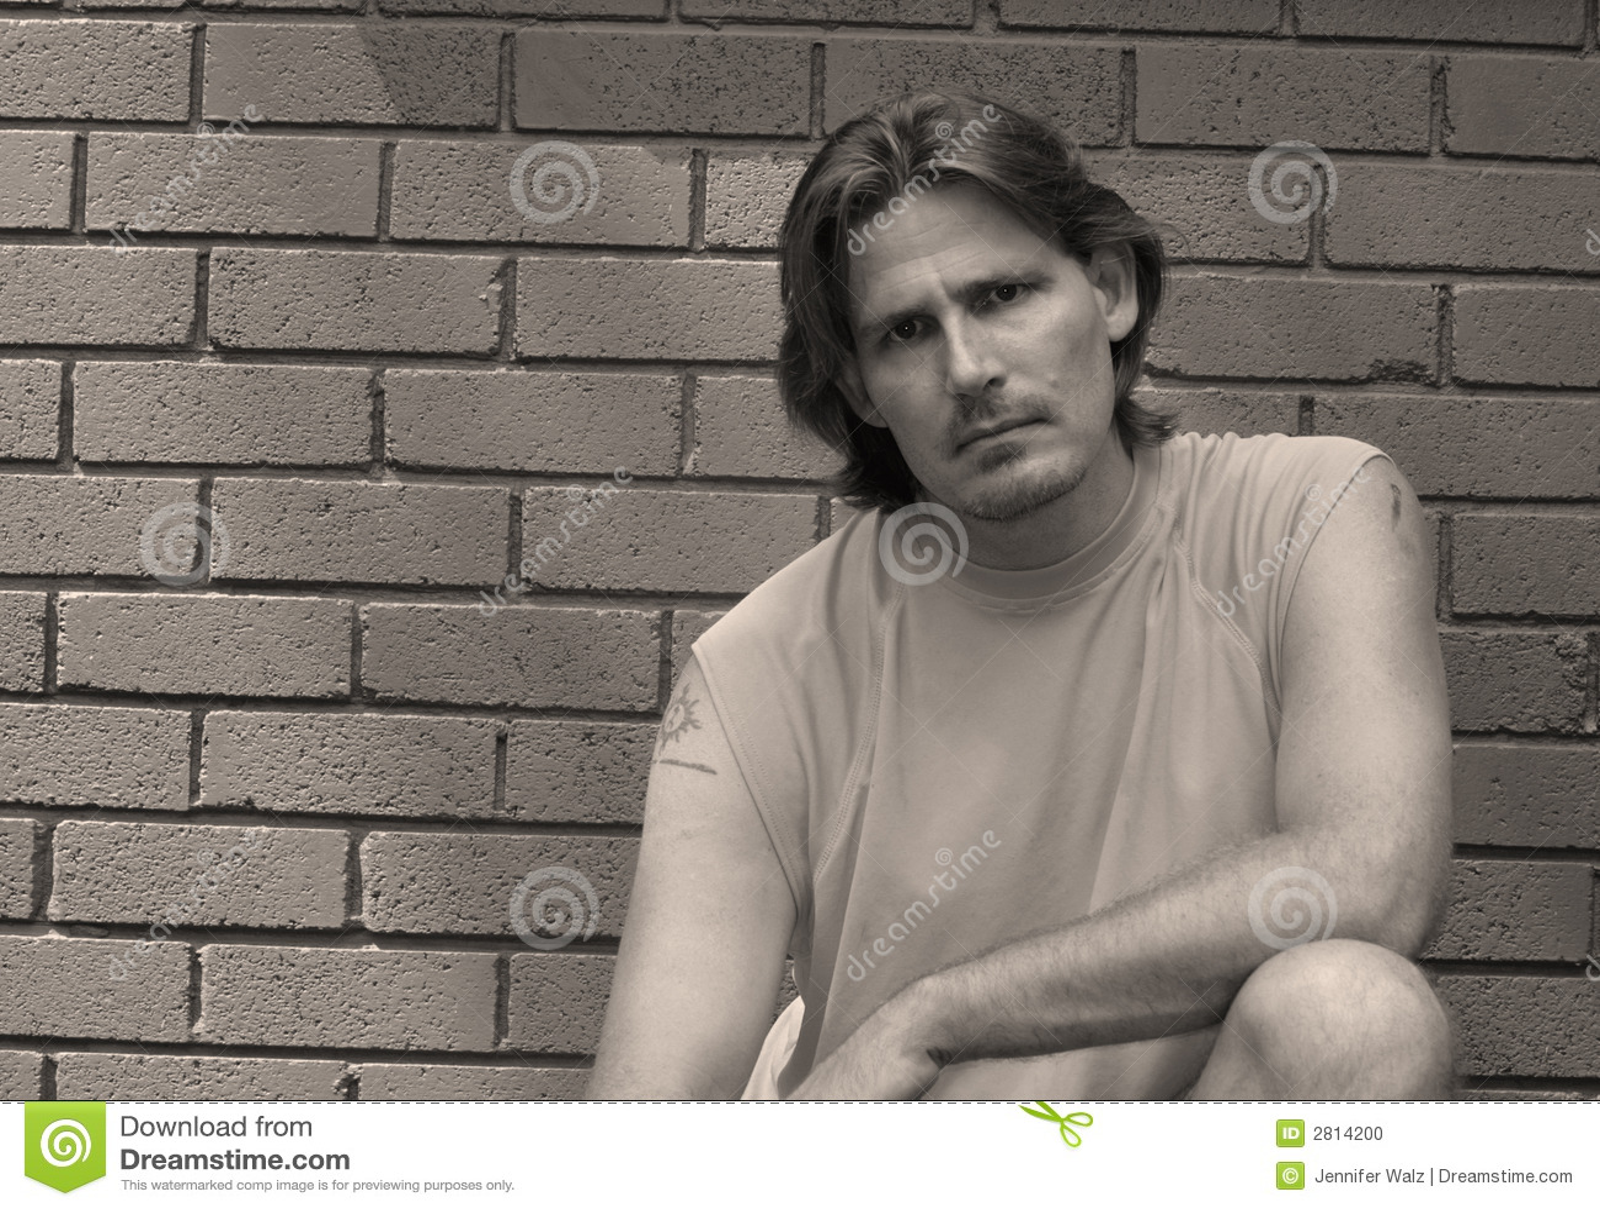 Man with Tough Look